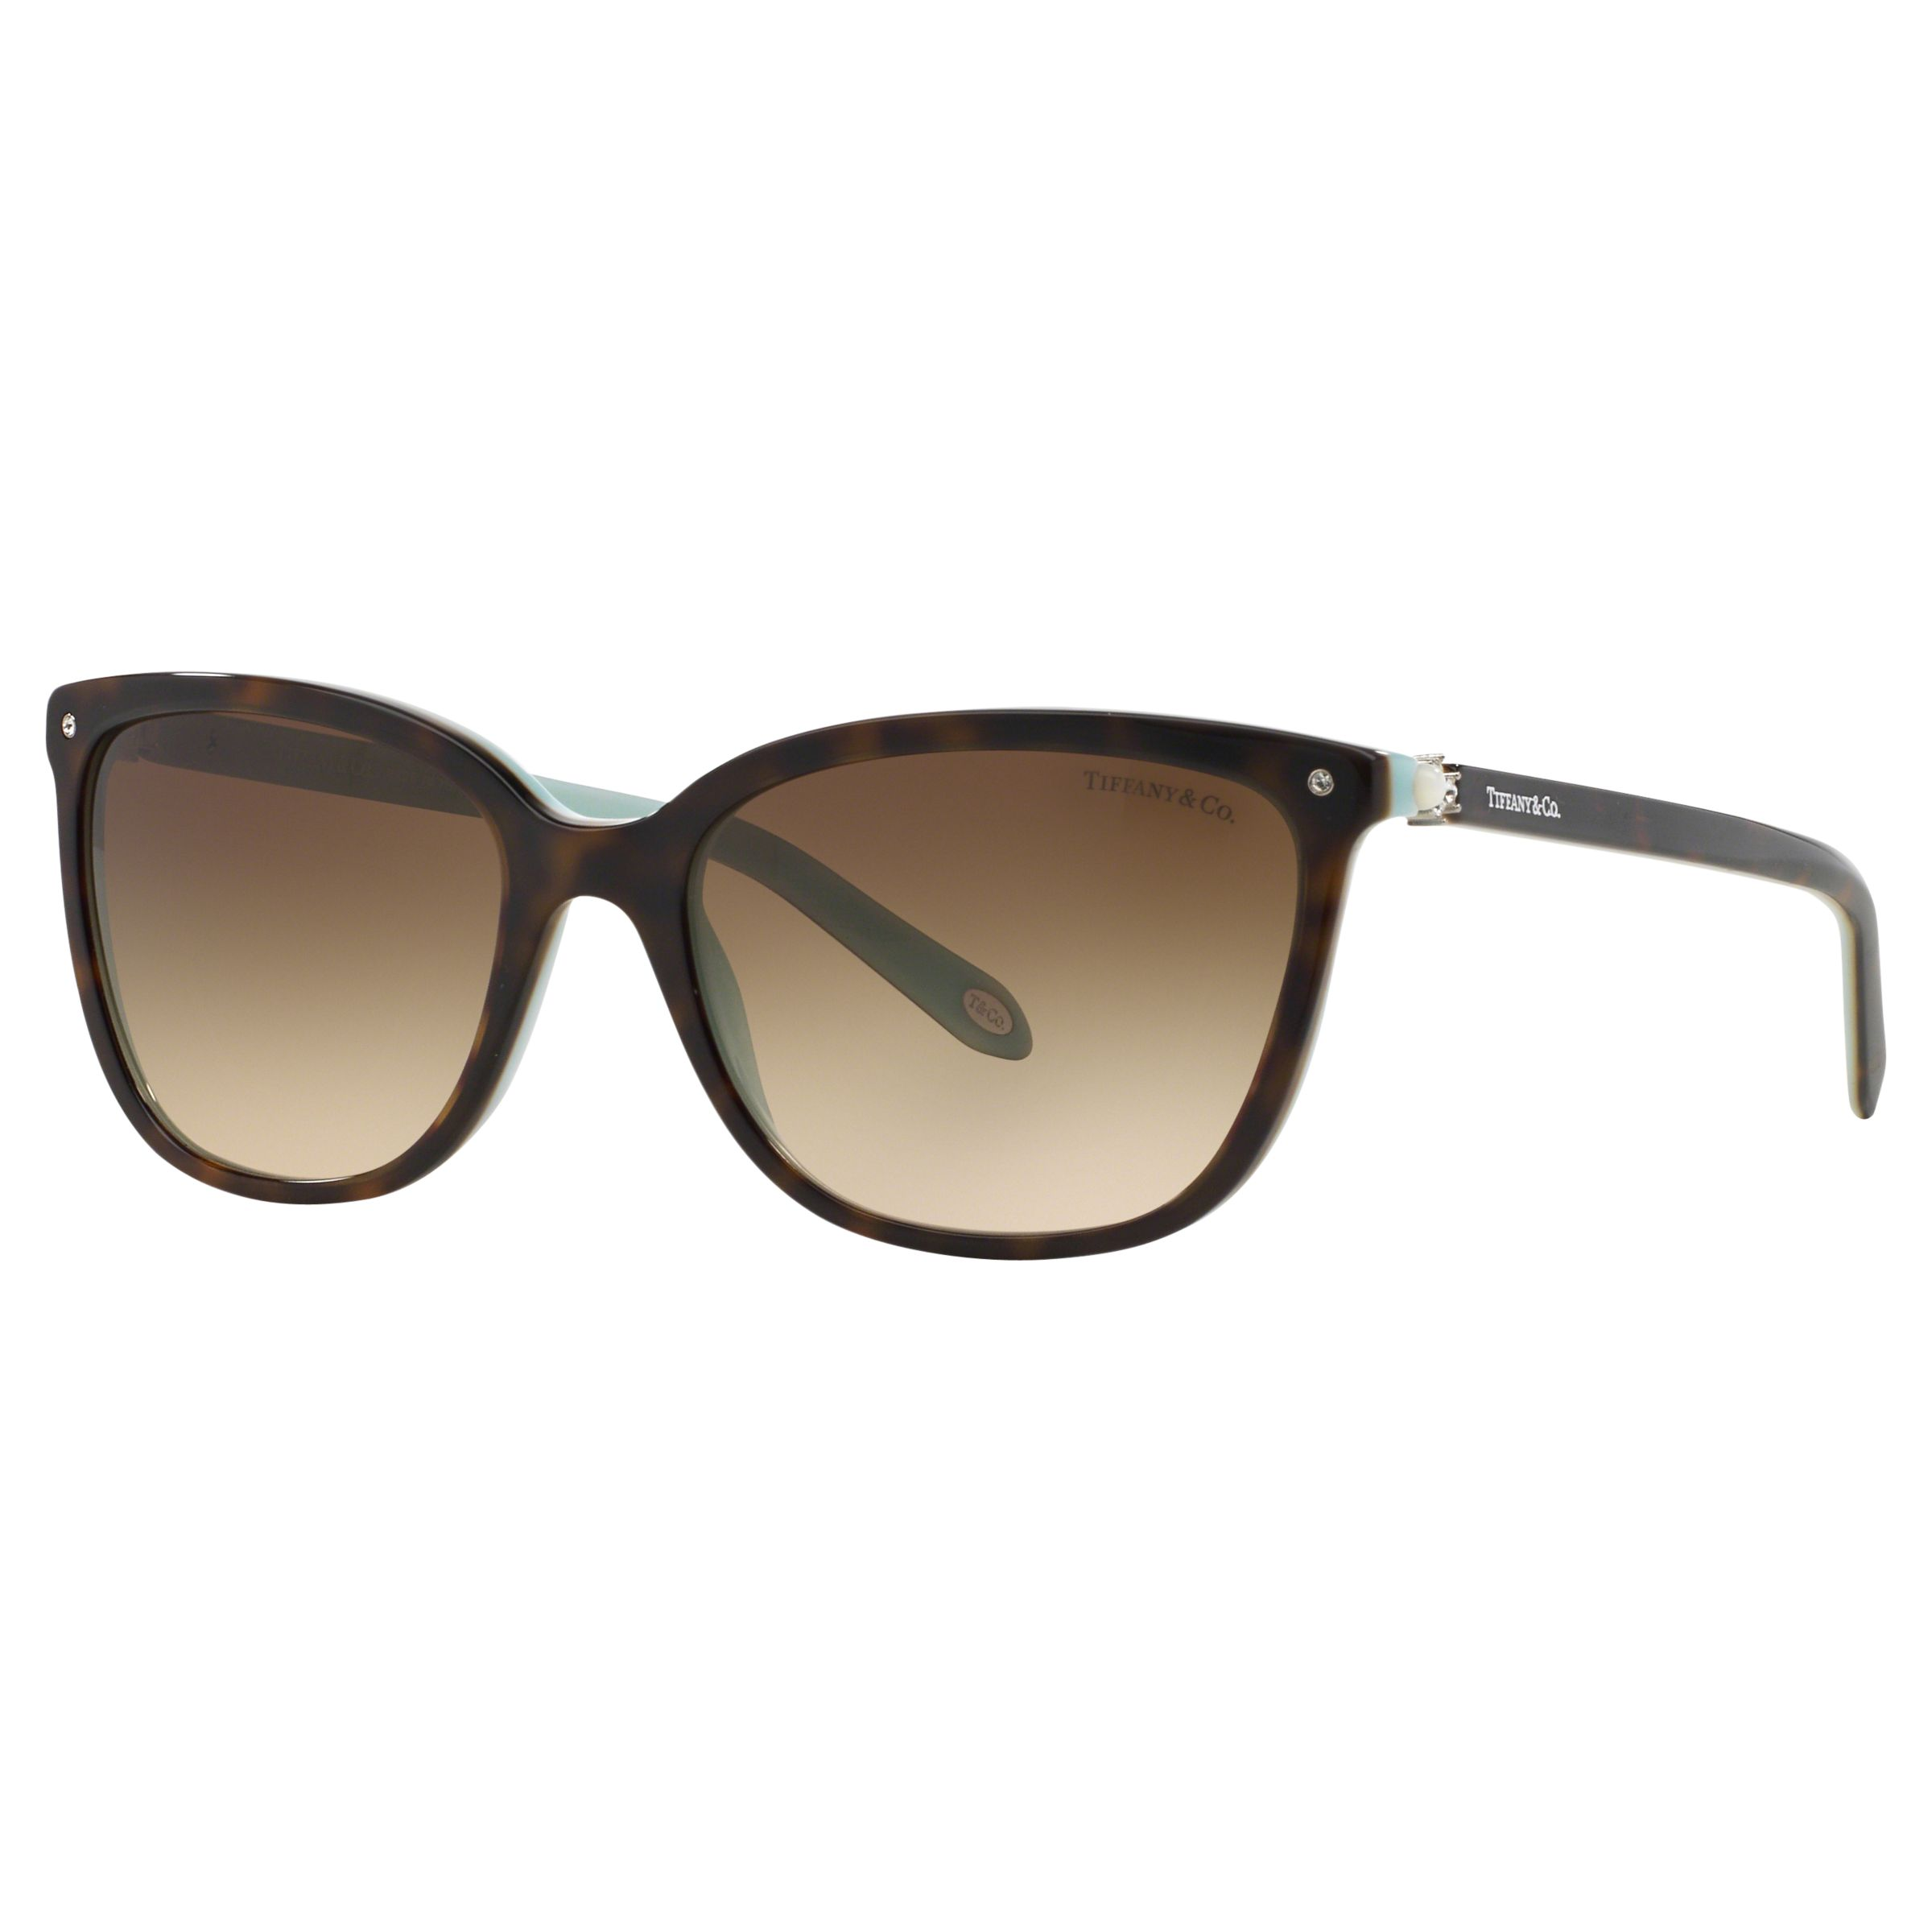 Tiffany & Co Tiffany & Co TF4105HB Square Sunglasses